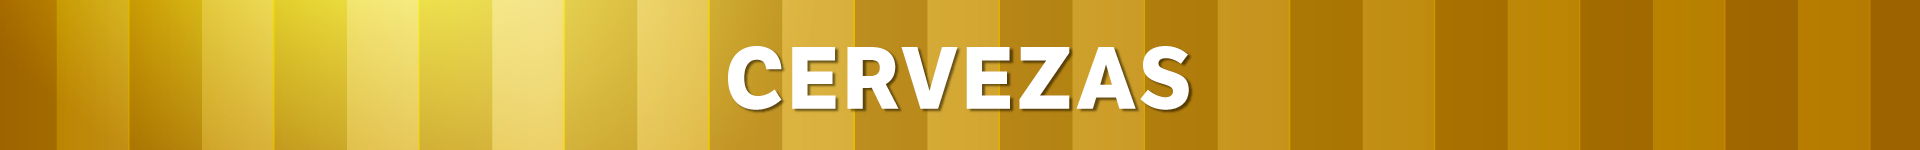 Banner Cervezas 1